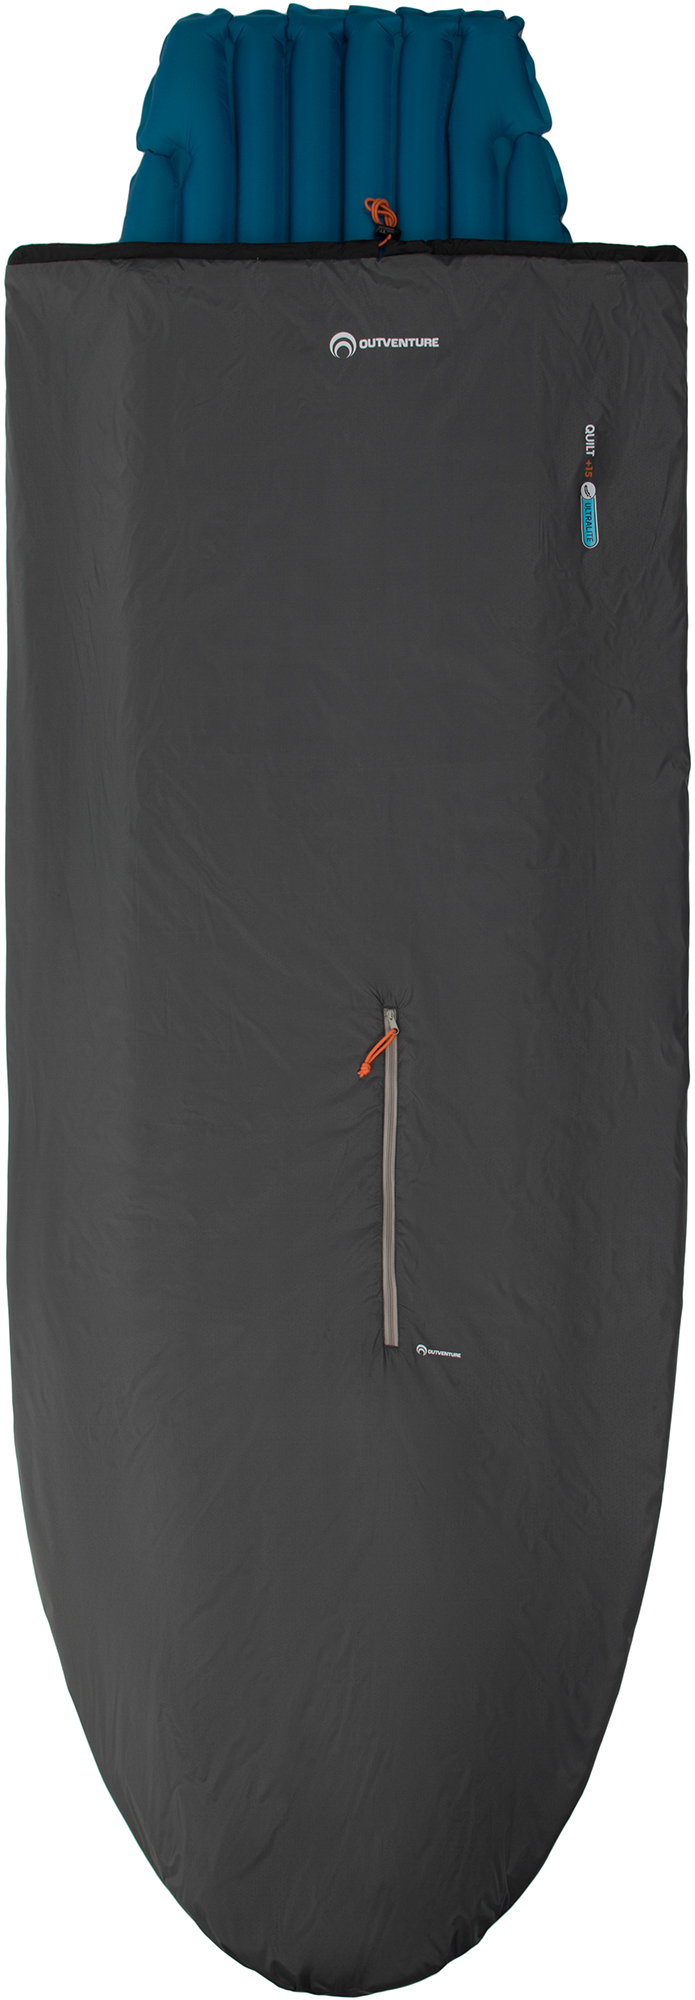 Outventure Спальный мешок Outventure Trek quilt +15 спальный мешок atemi dream